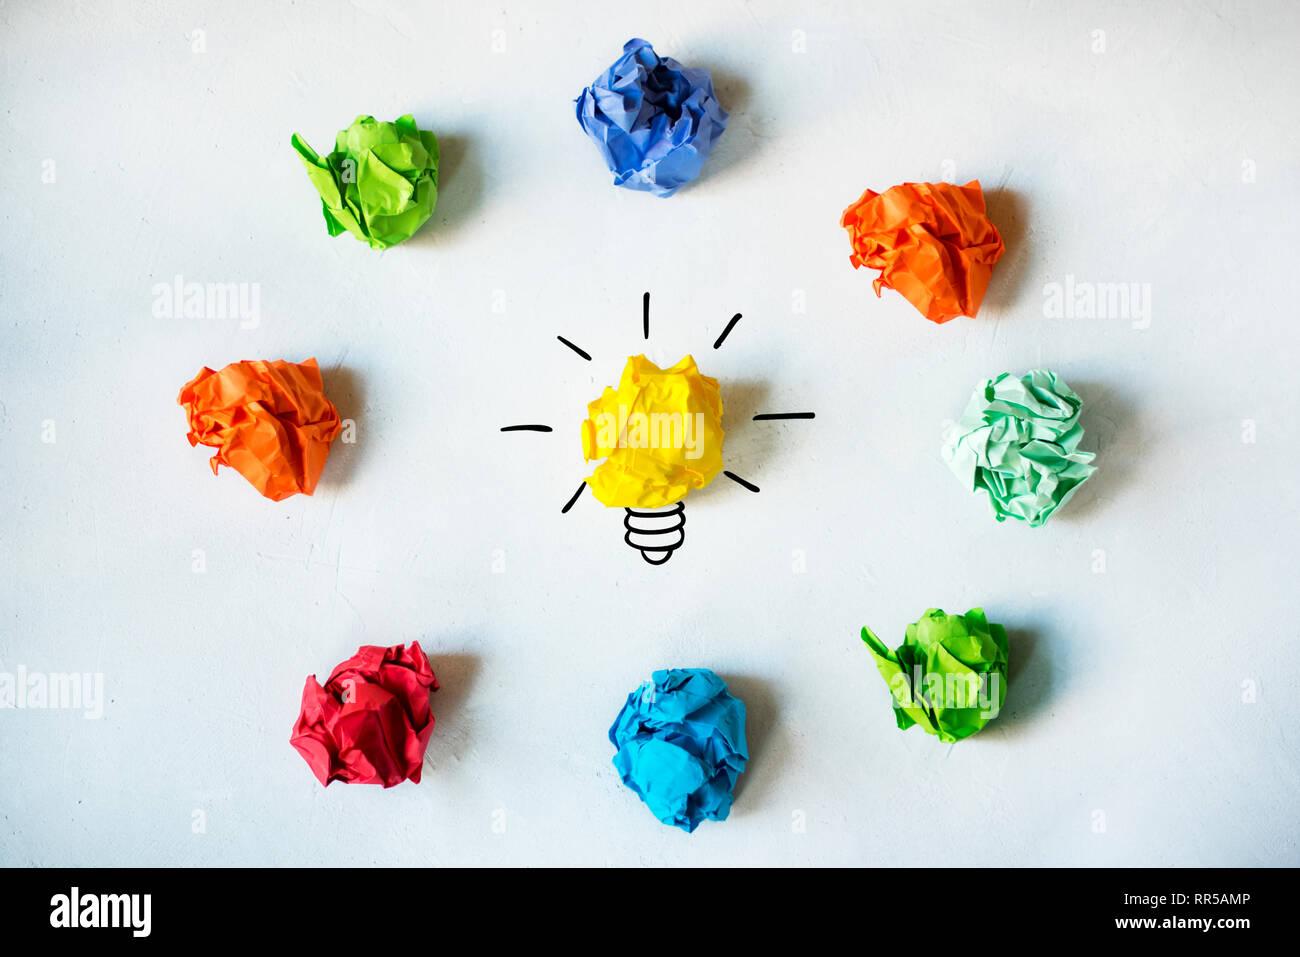 New Idea Concept. Colorful Crumpled Paper Balls Stock Photo